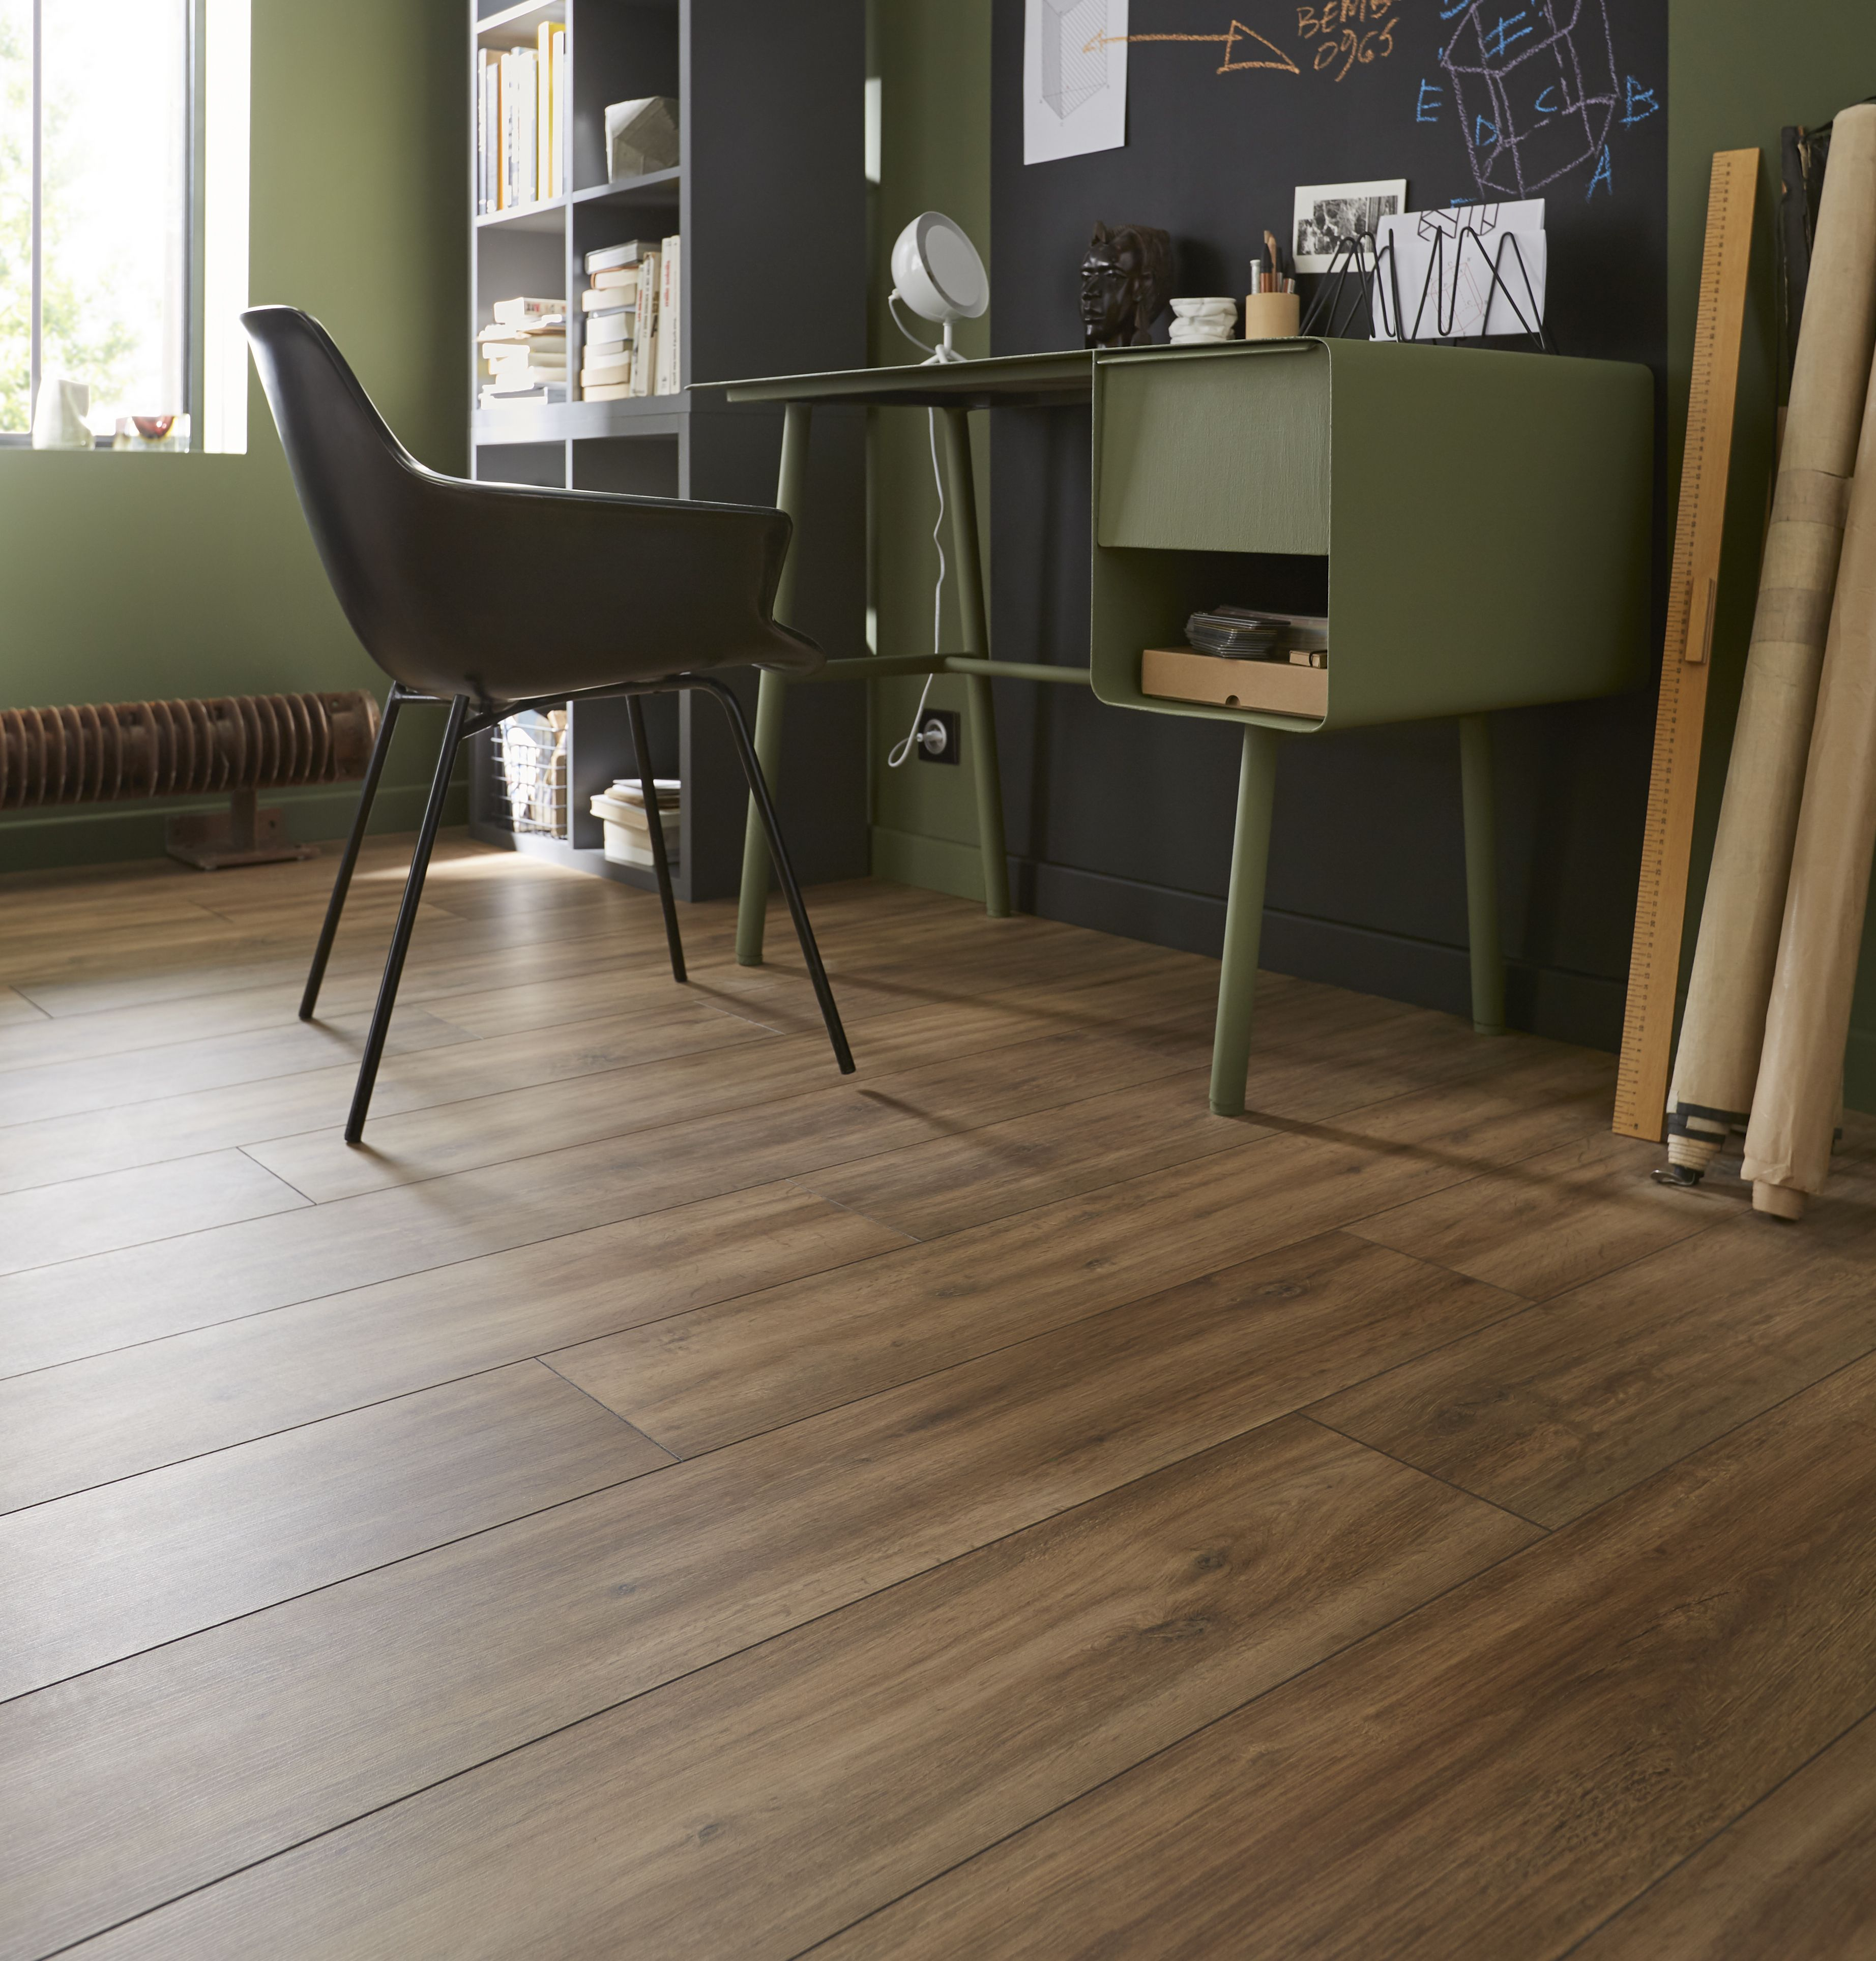 devonport natural oak effect laminate flooring m pack departments diy at bu0026q